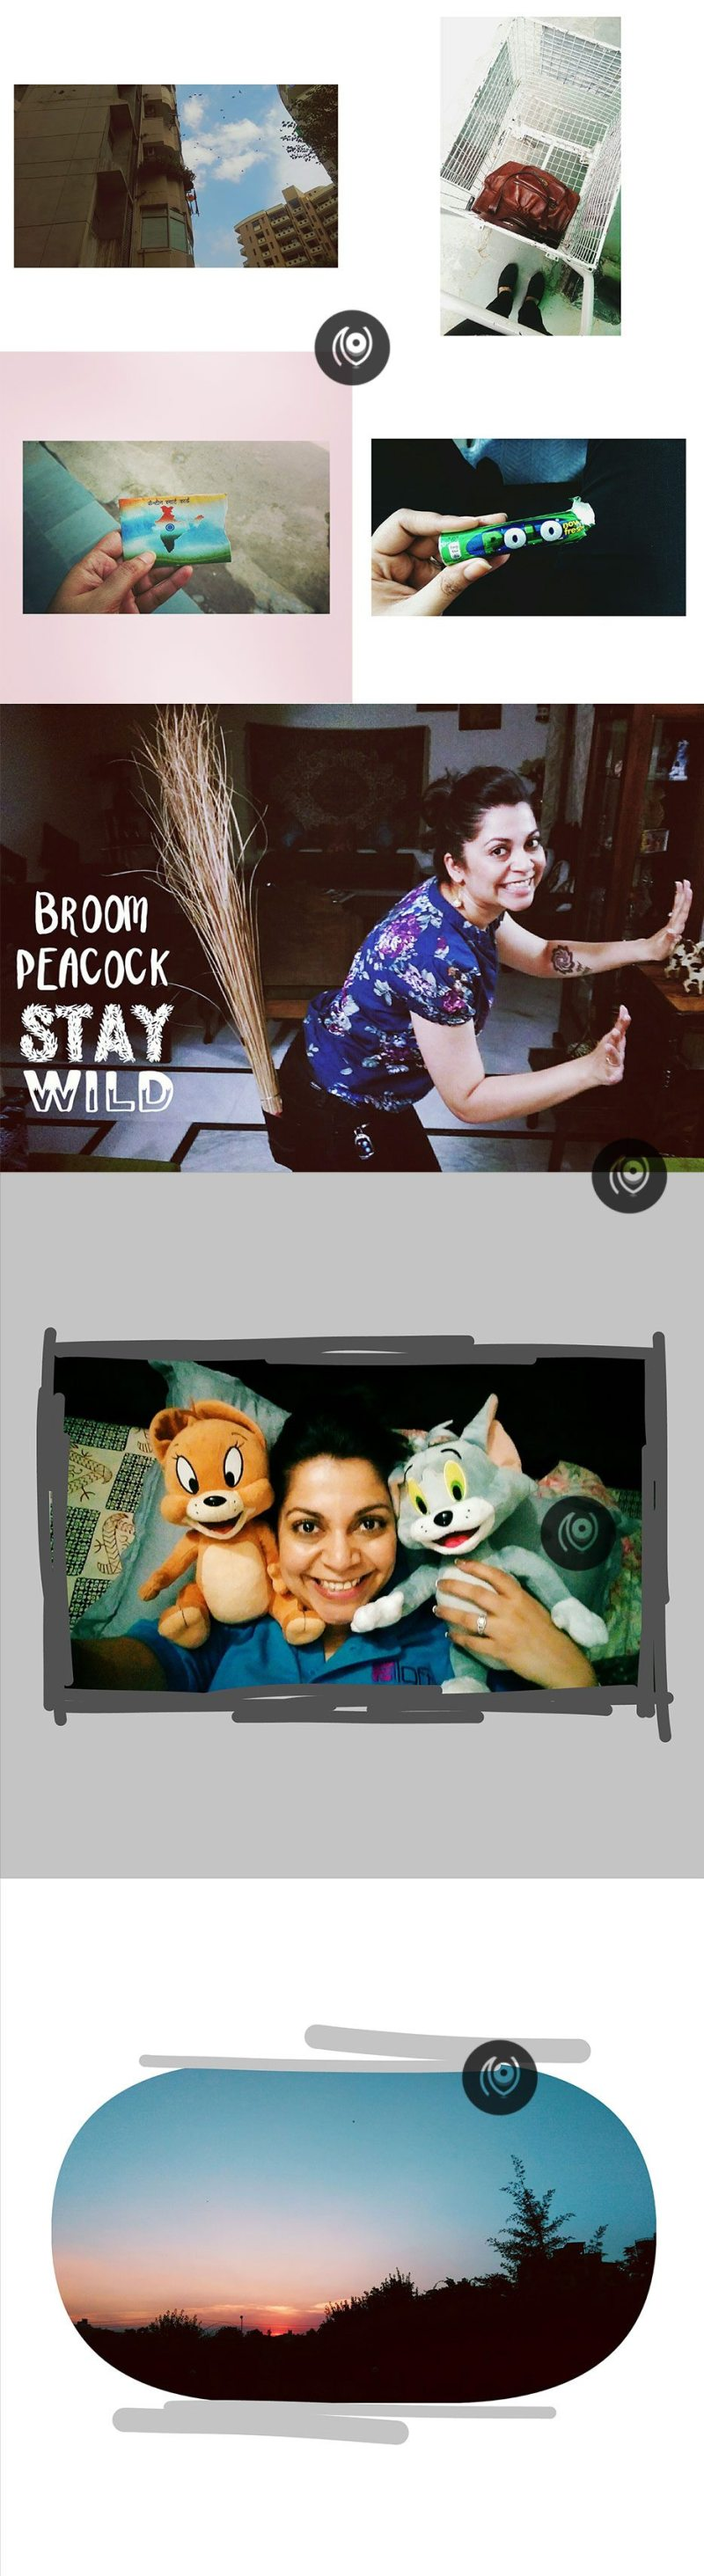 Naina.co-Photographer-Raconteuse-Storyteller-Luxury-Lifestyle-September-2014-WhatsUpNaina-Photographs-Selfies